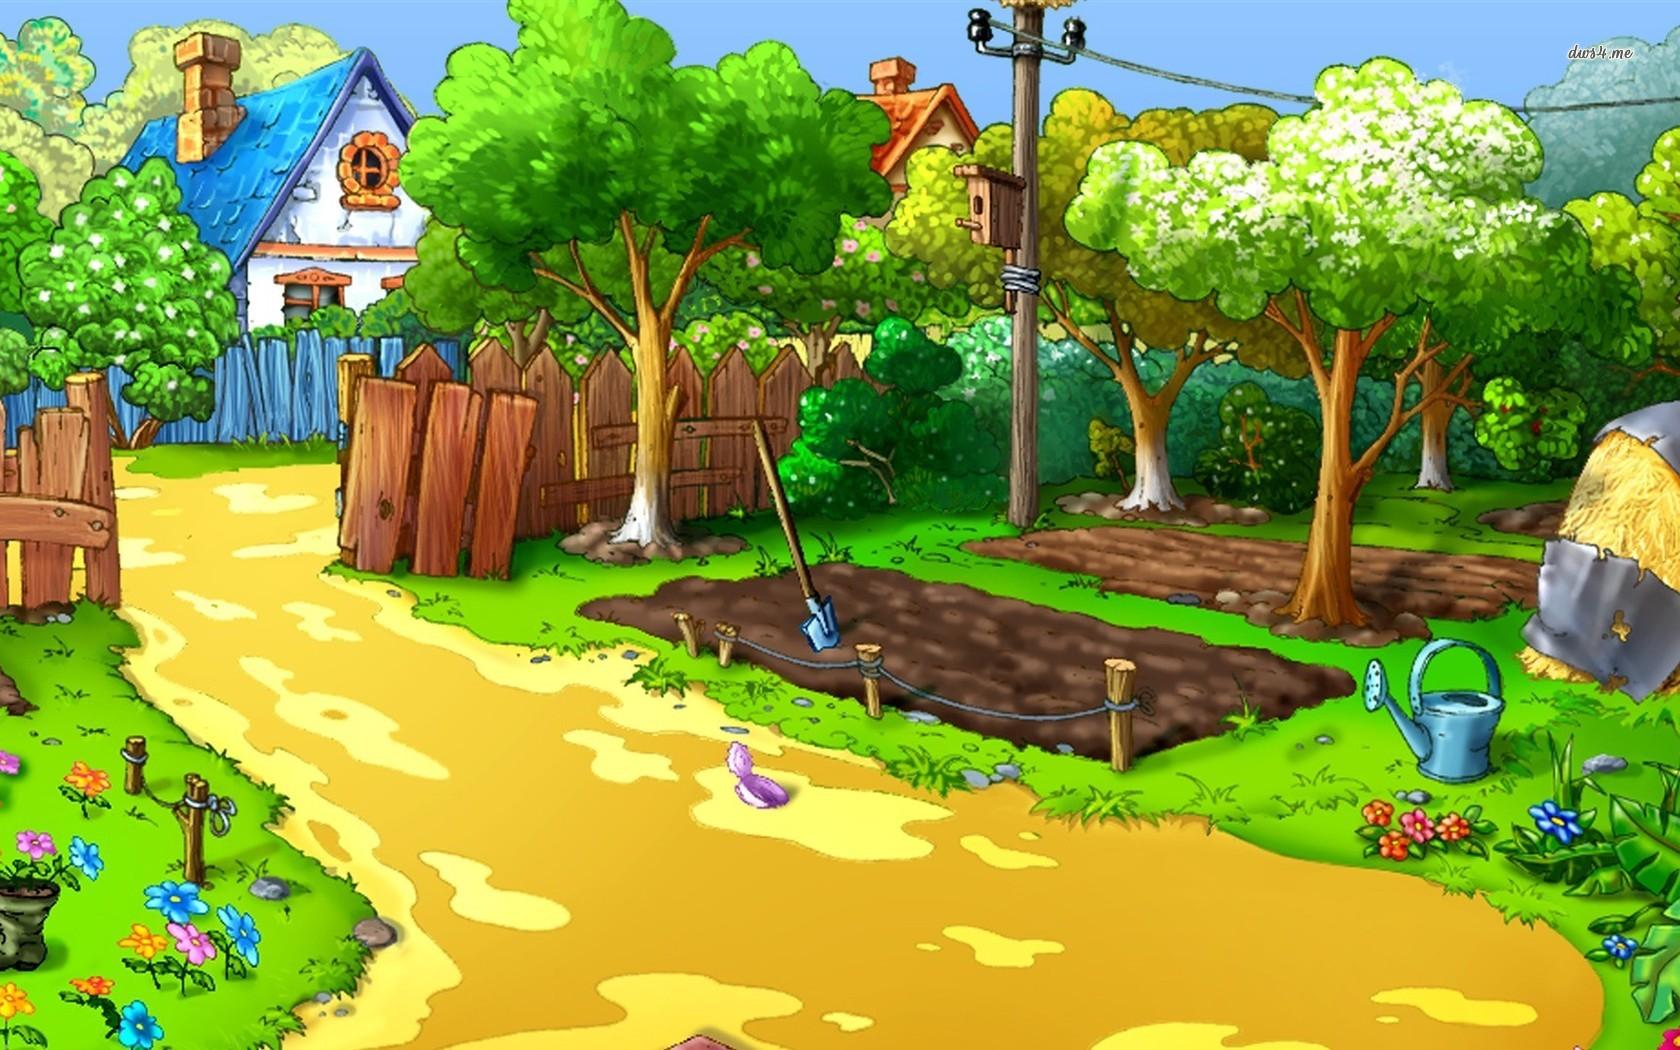 description download wallpaper titled cartoon farm wallpaper for your 1680x1050